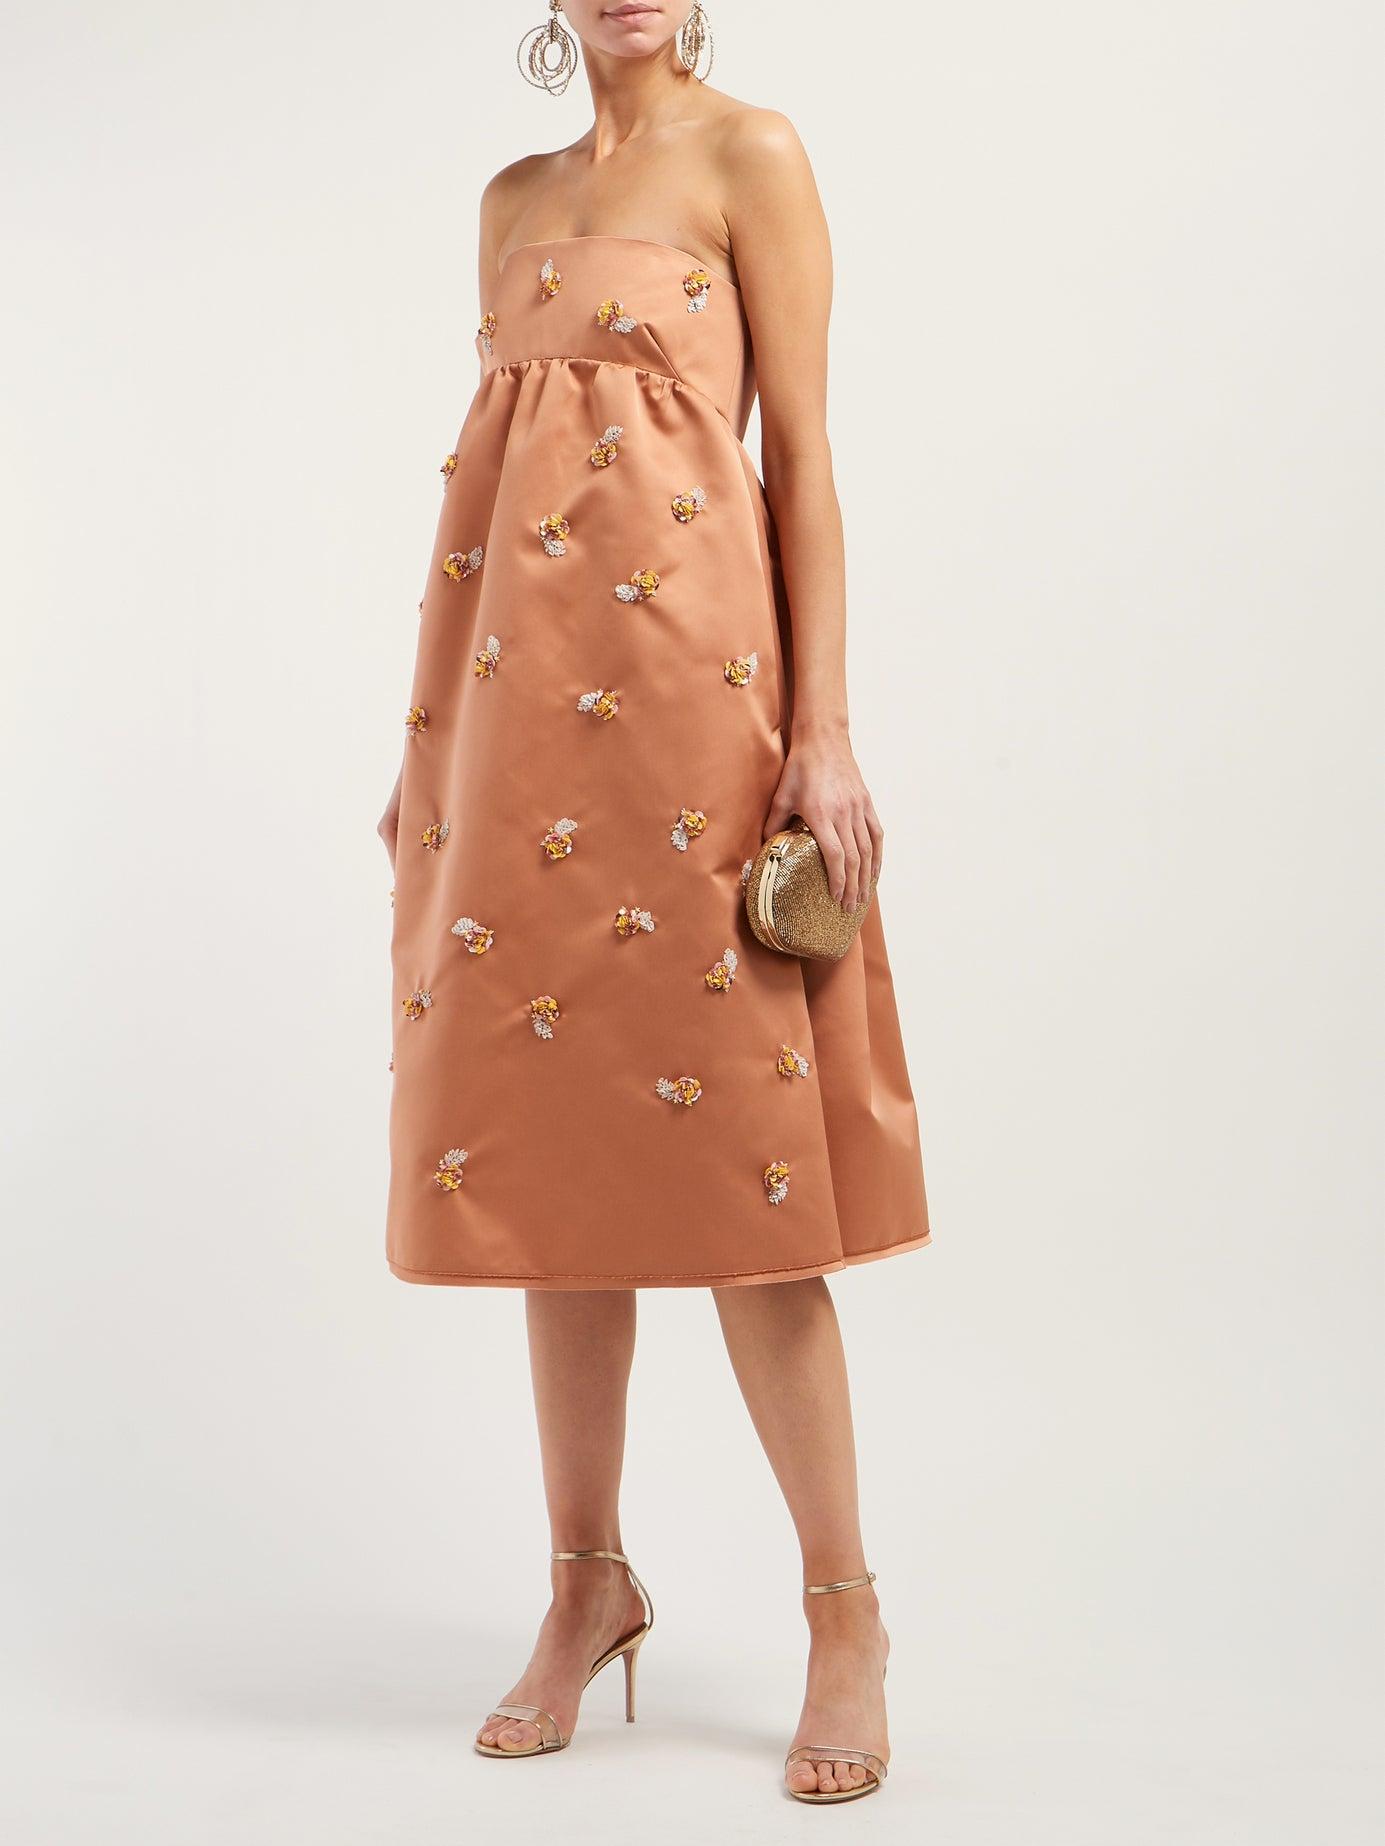 rochas dress.jpg